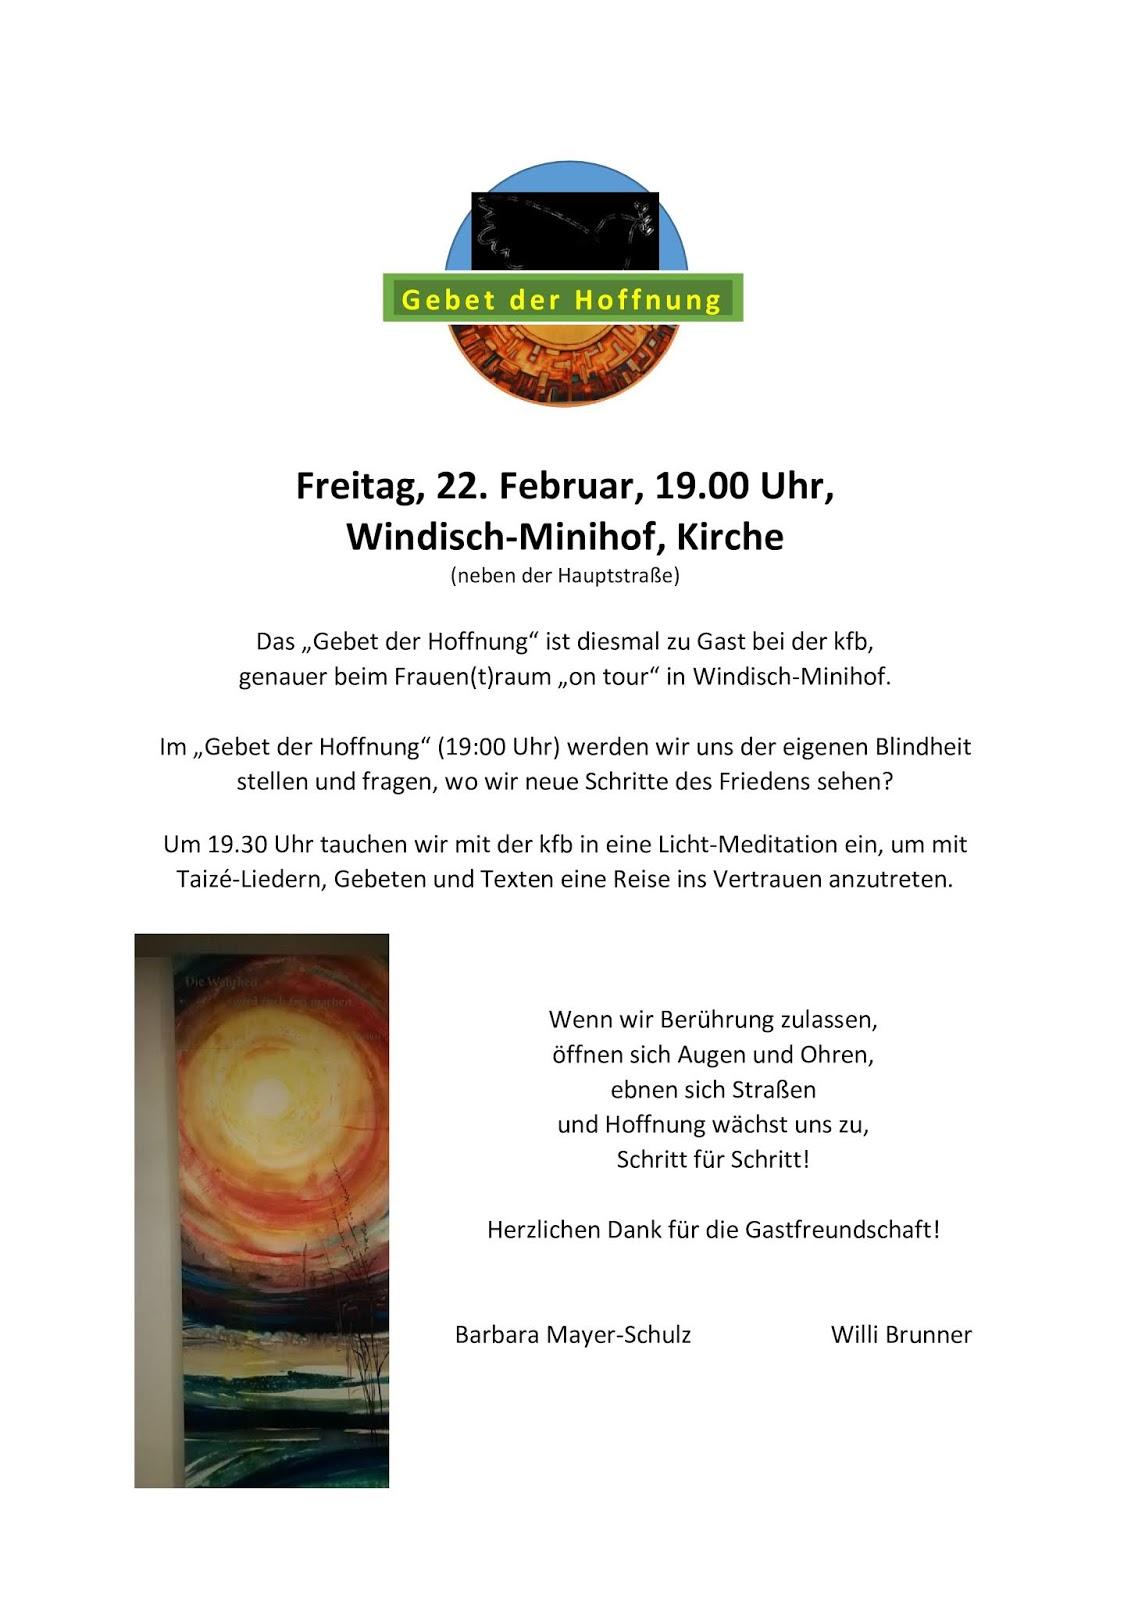 Leute | Beitrge zur Rubrik aus Jennersdorf - intertecinc.com